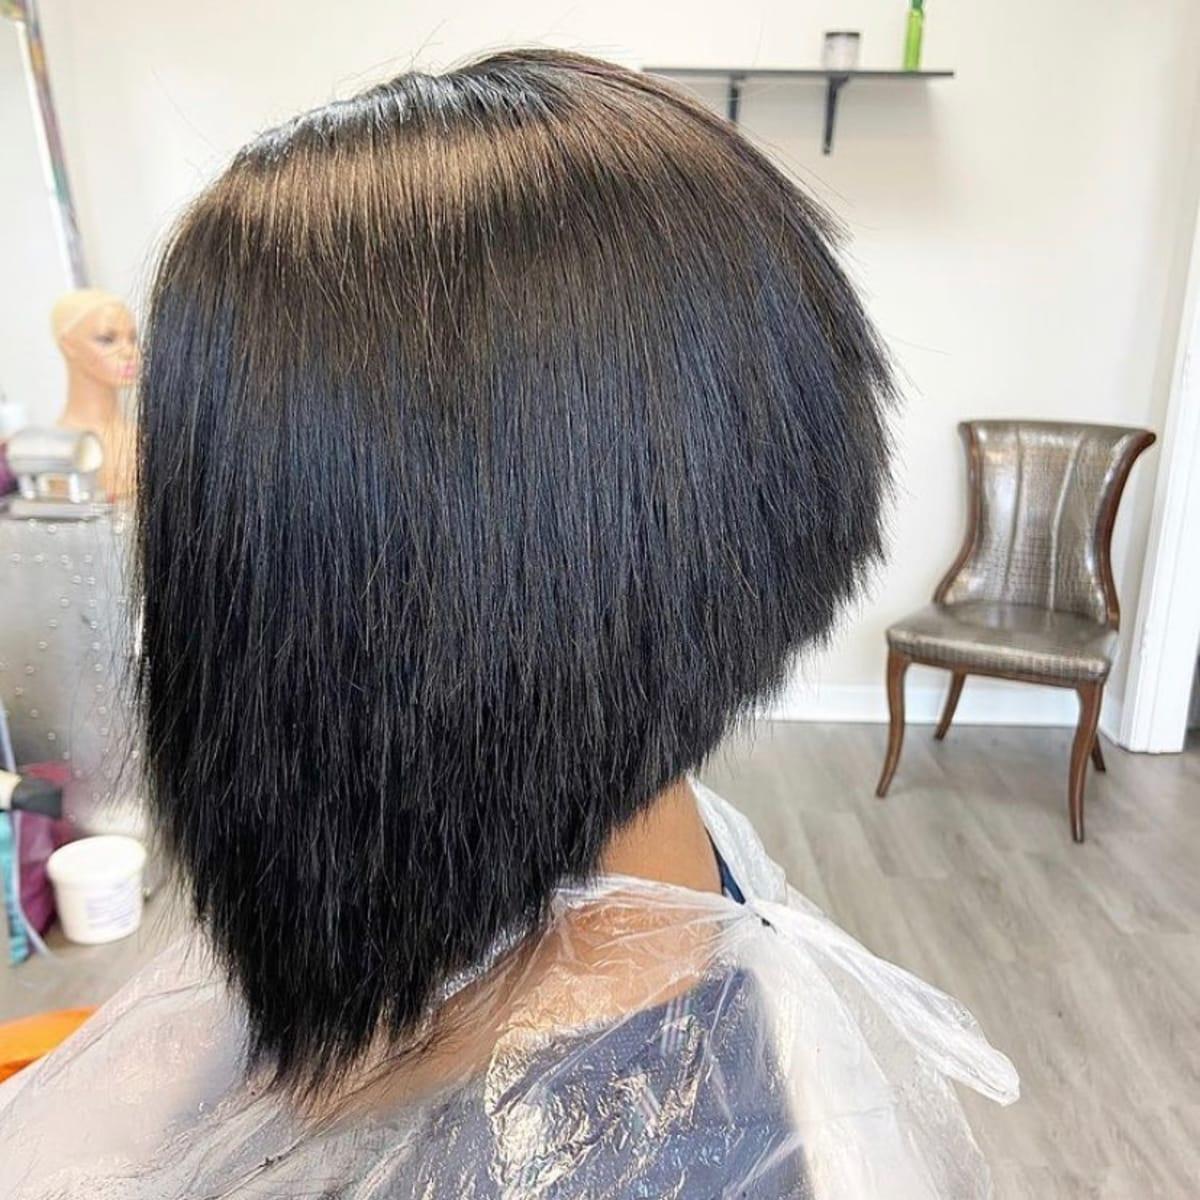 23 Incredible Medium Length Inverted Bob Haircut Ideas